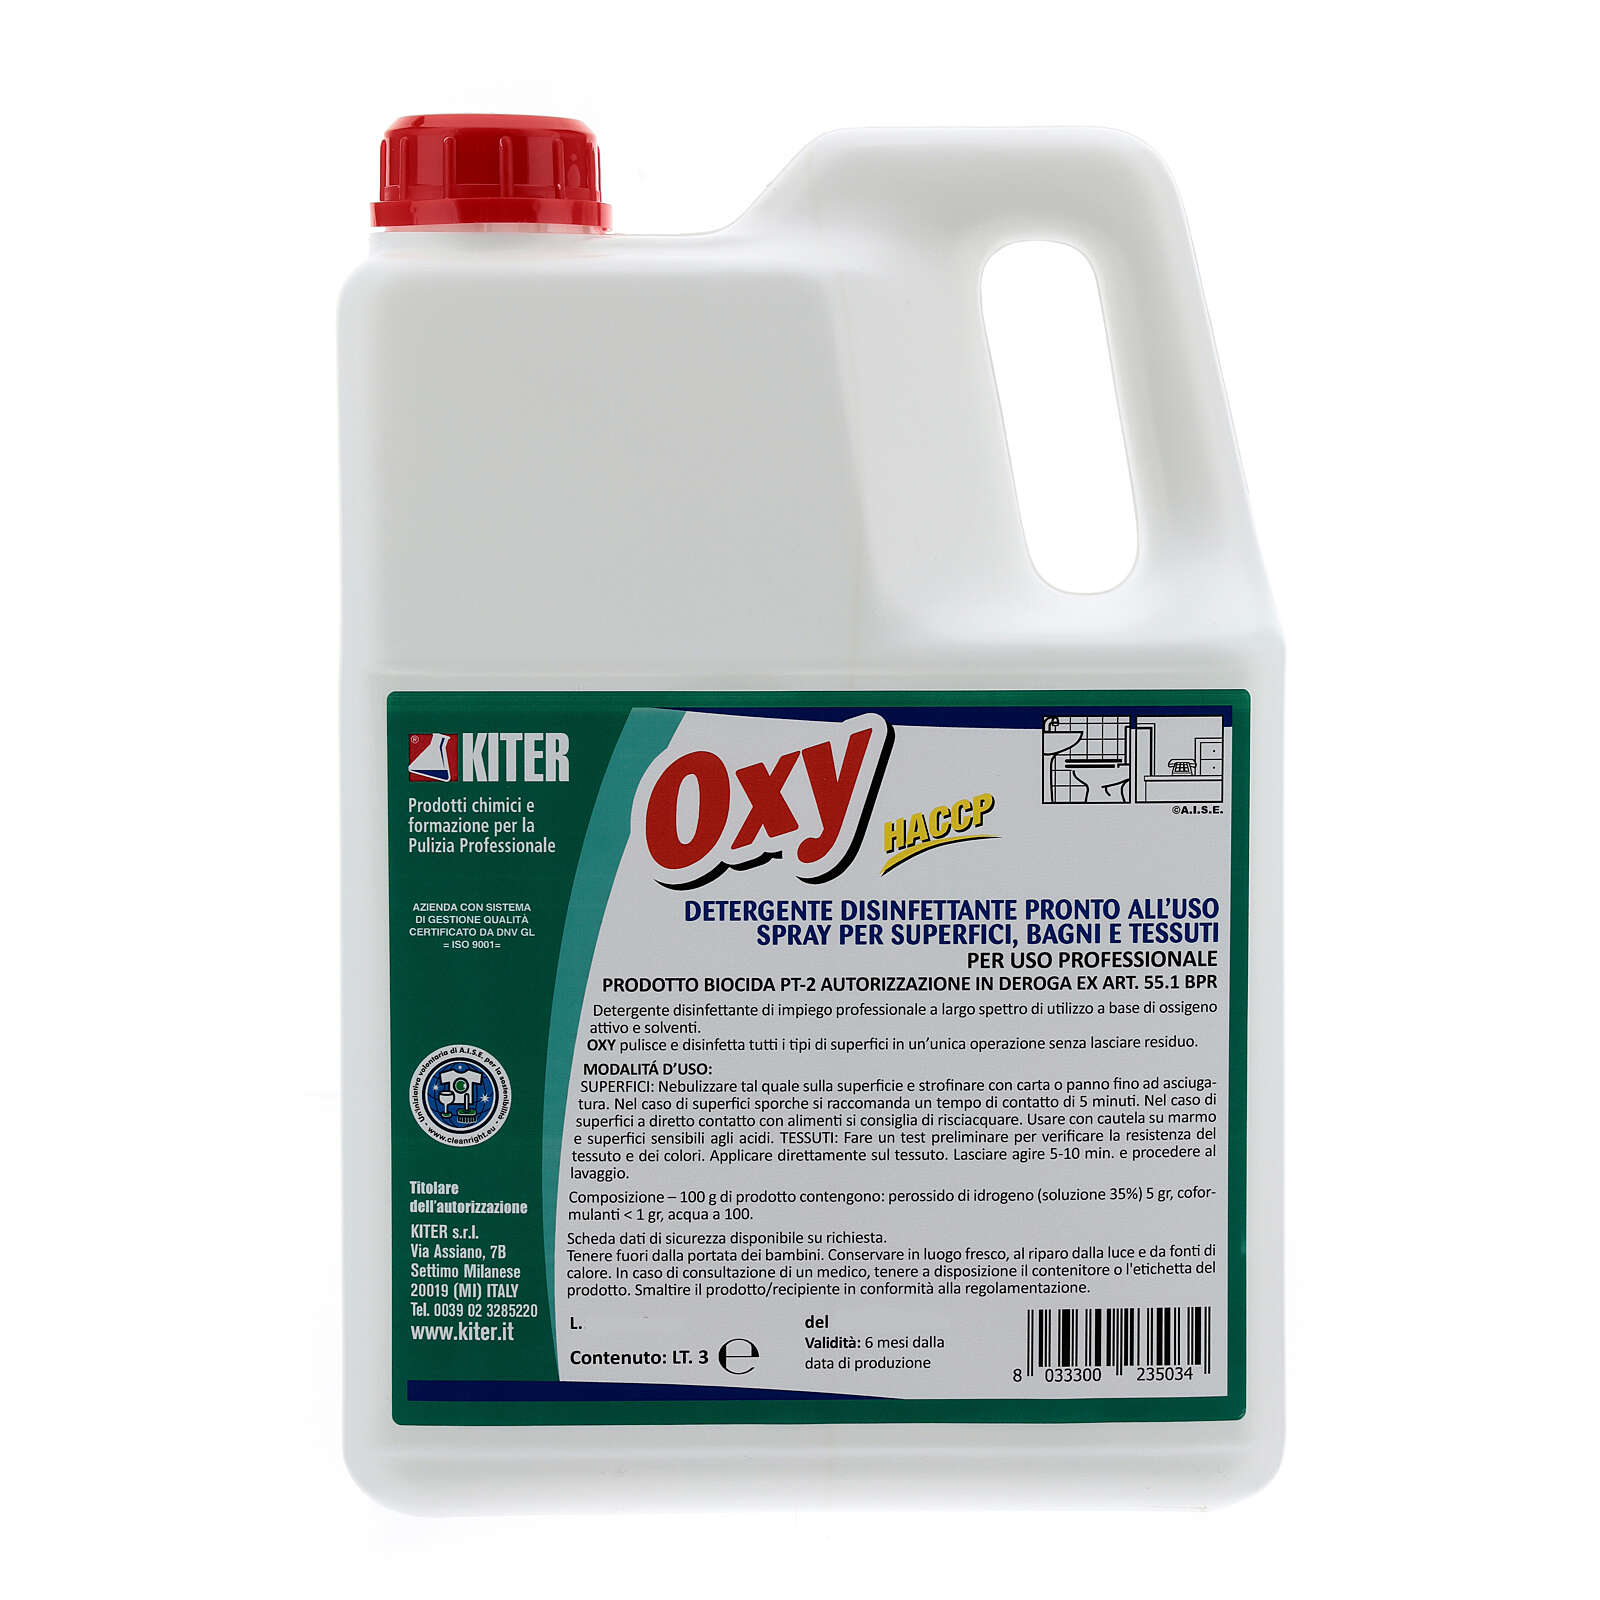 Desinfektionsspray Oxy Biocida, 3 Liter 3